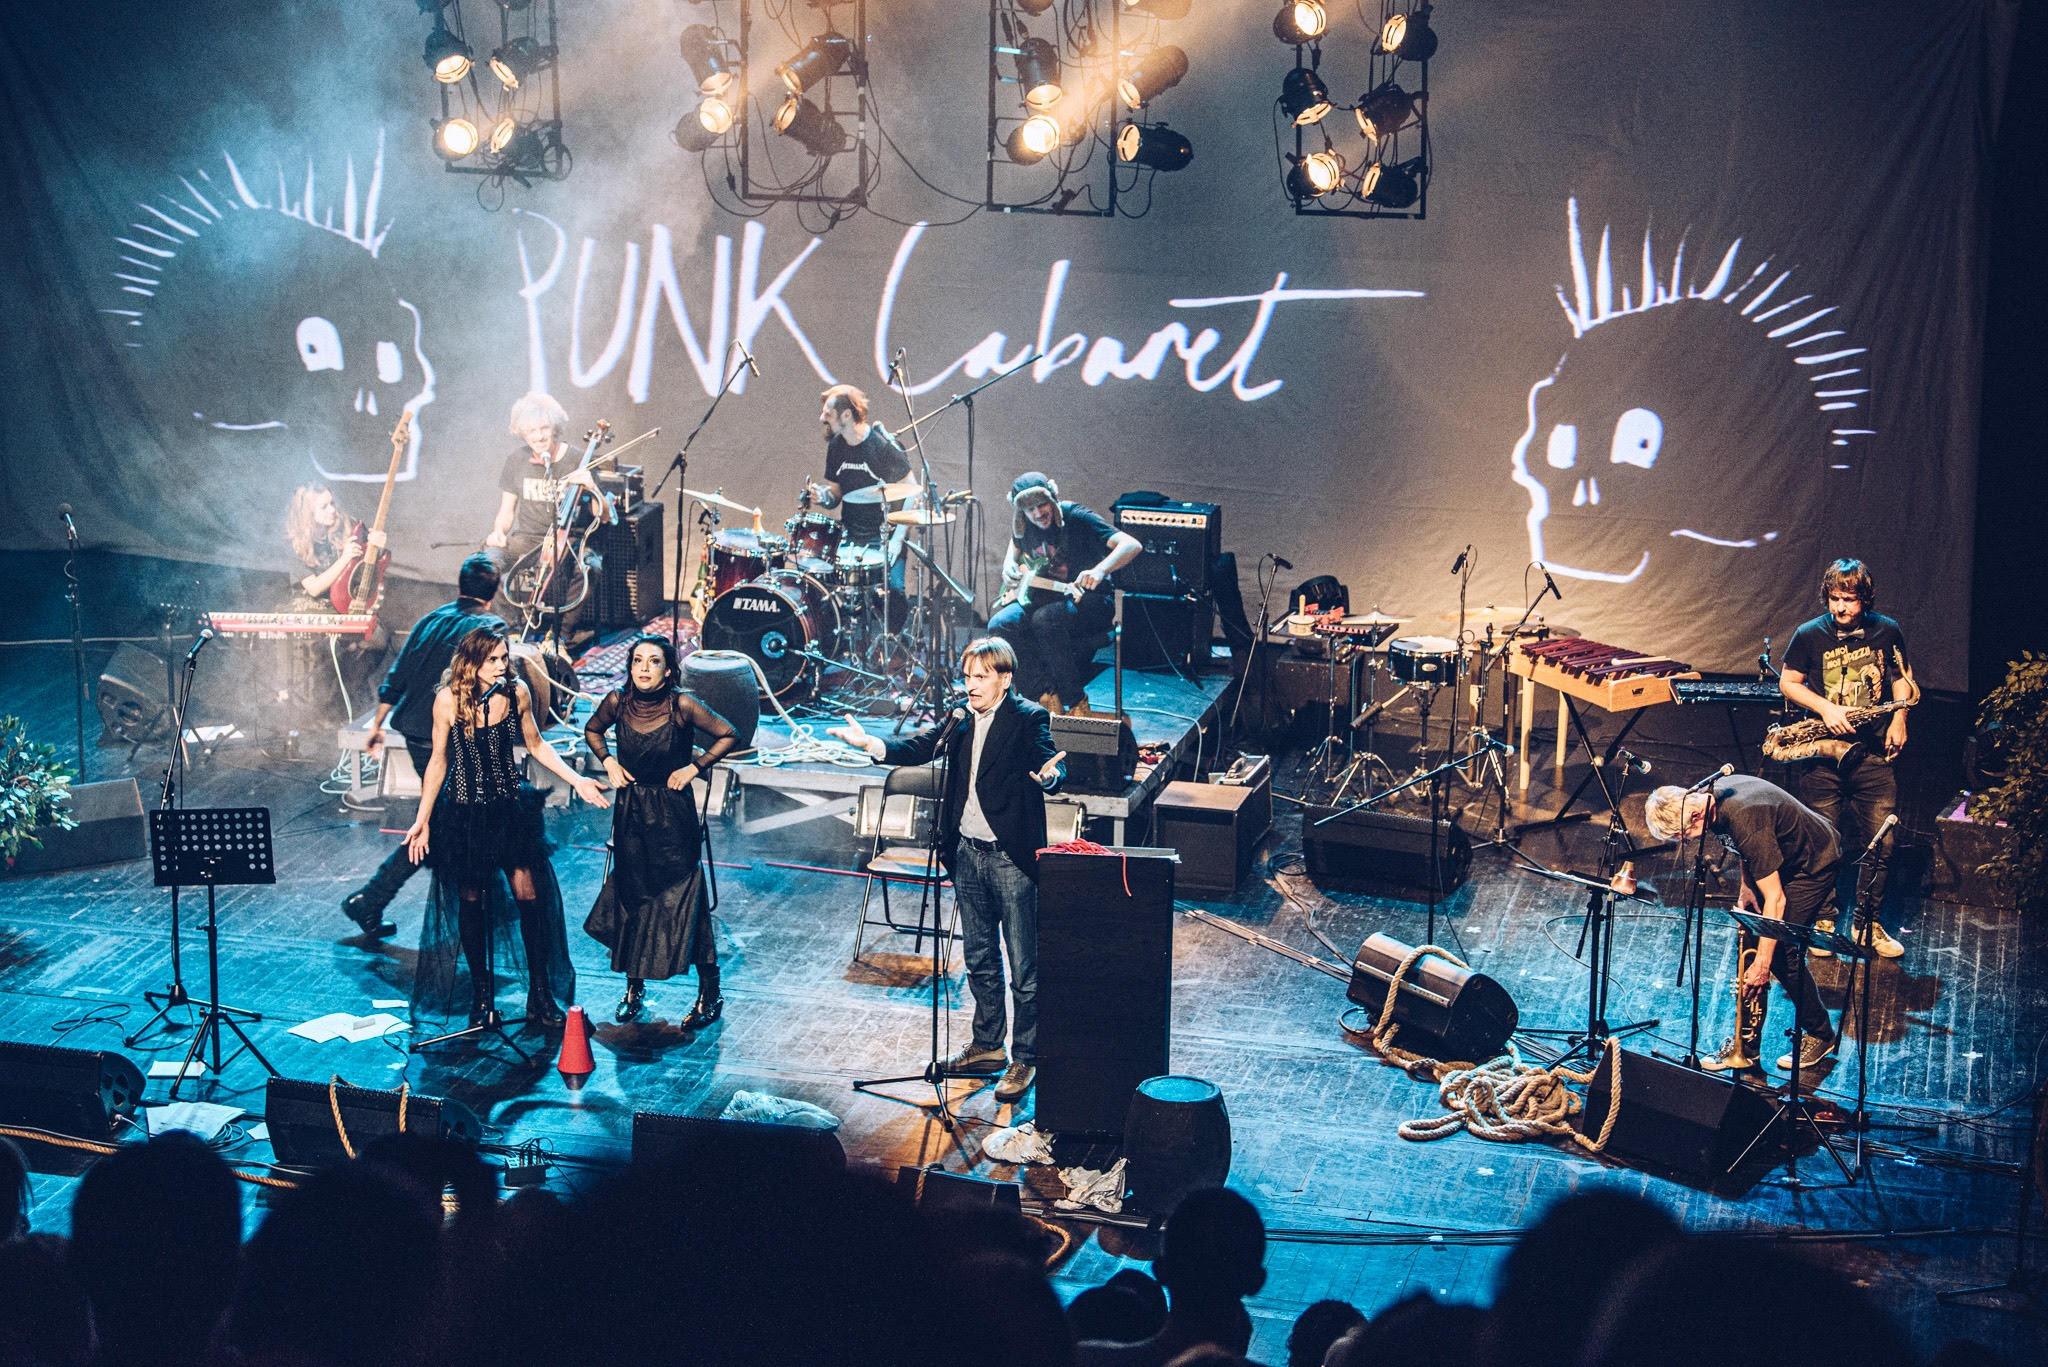 Punk-Cabaret_live_3